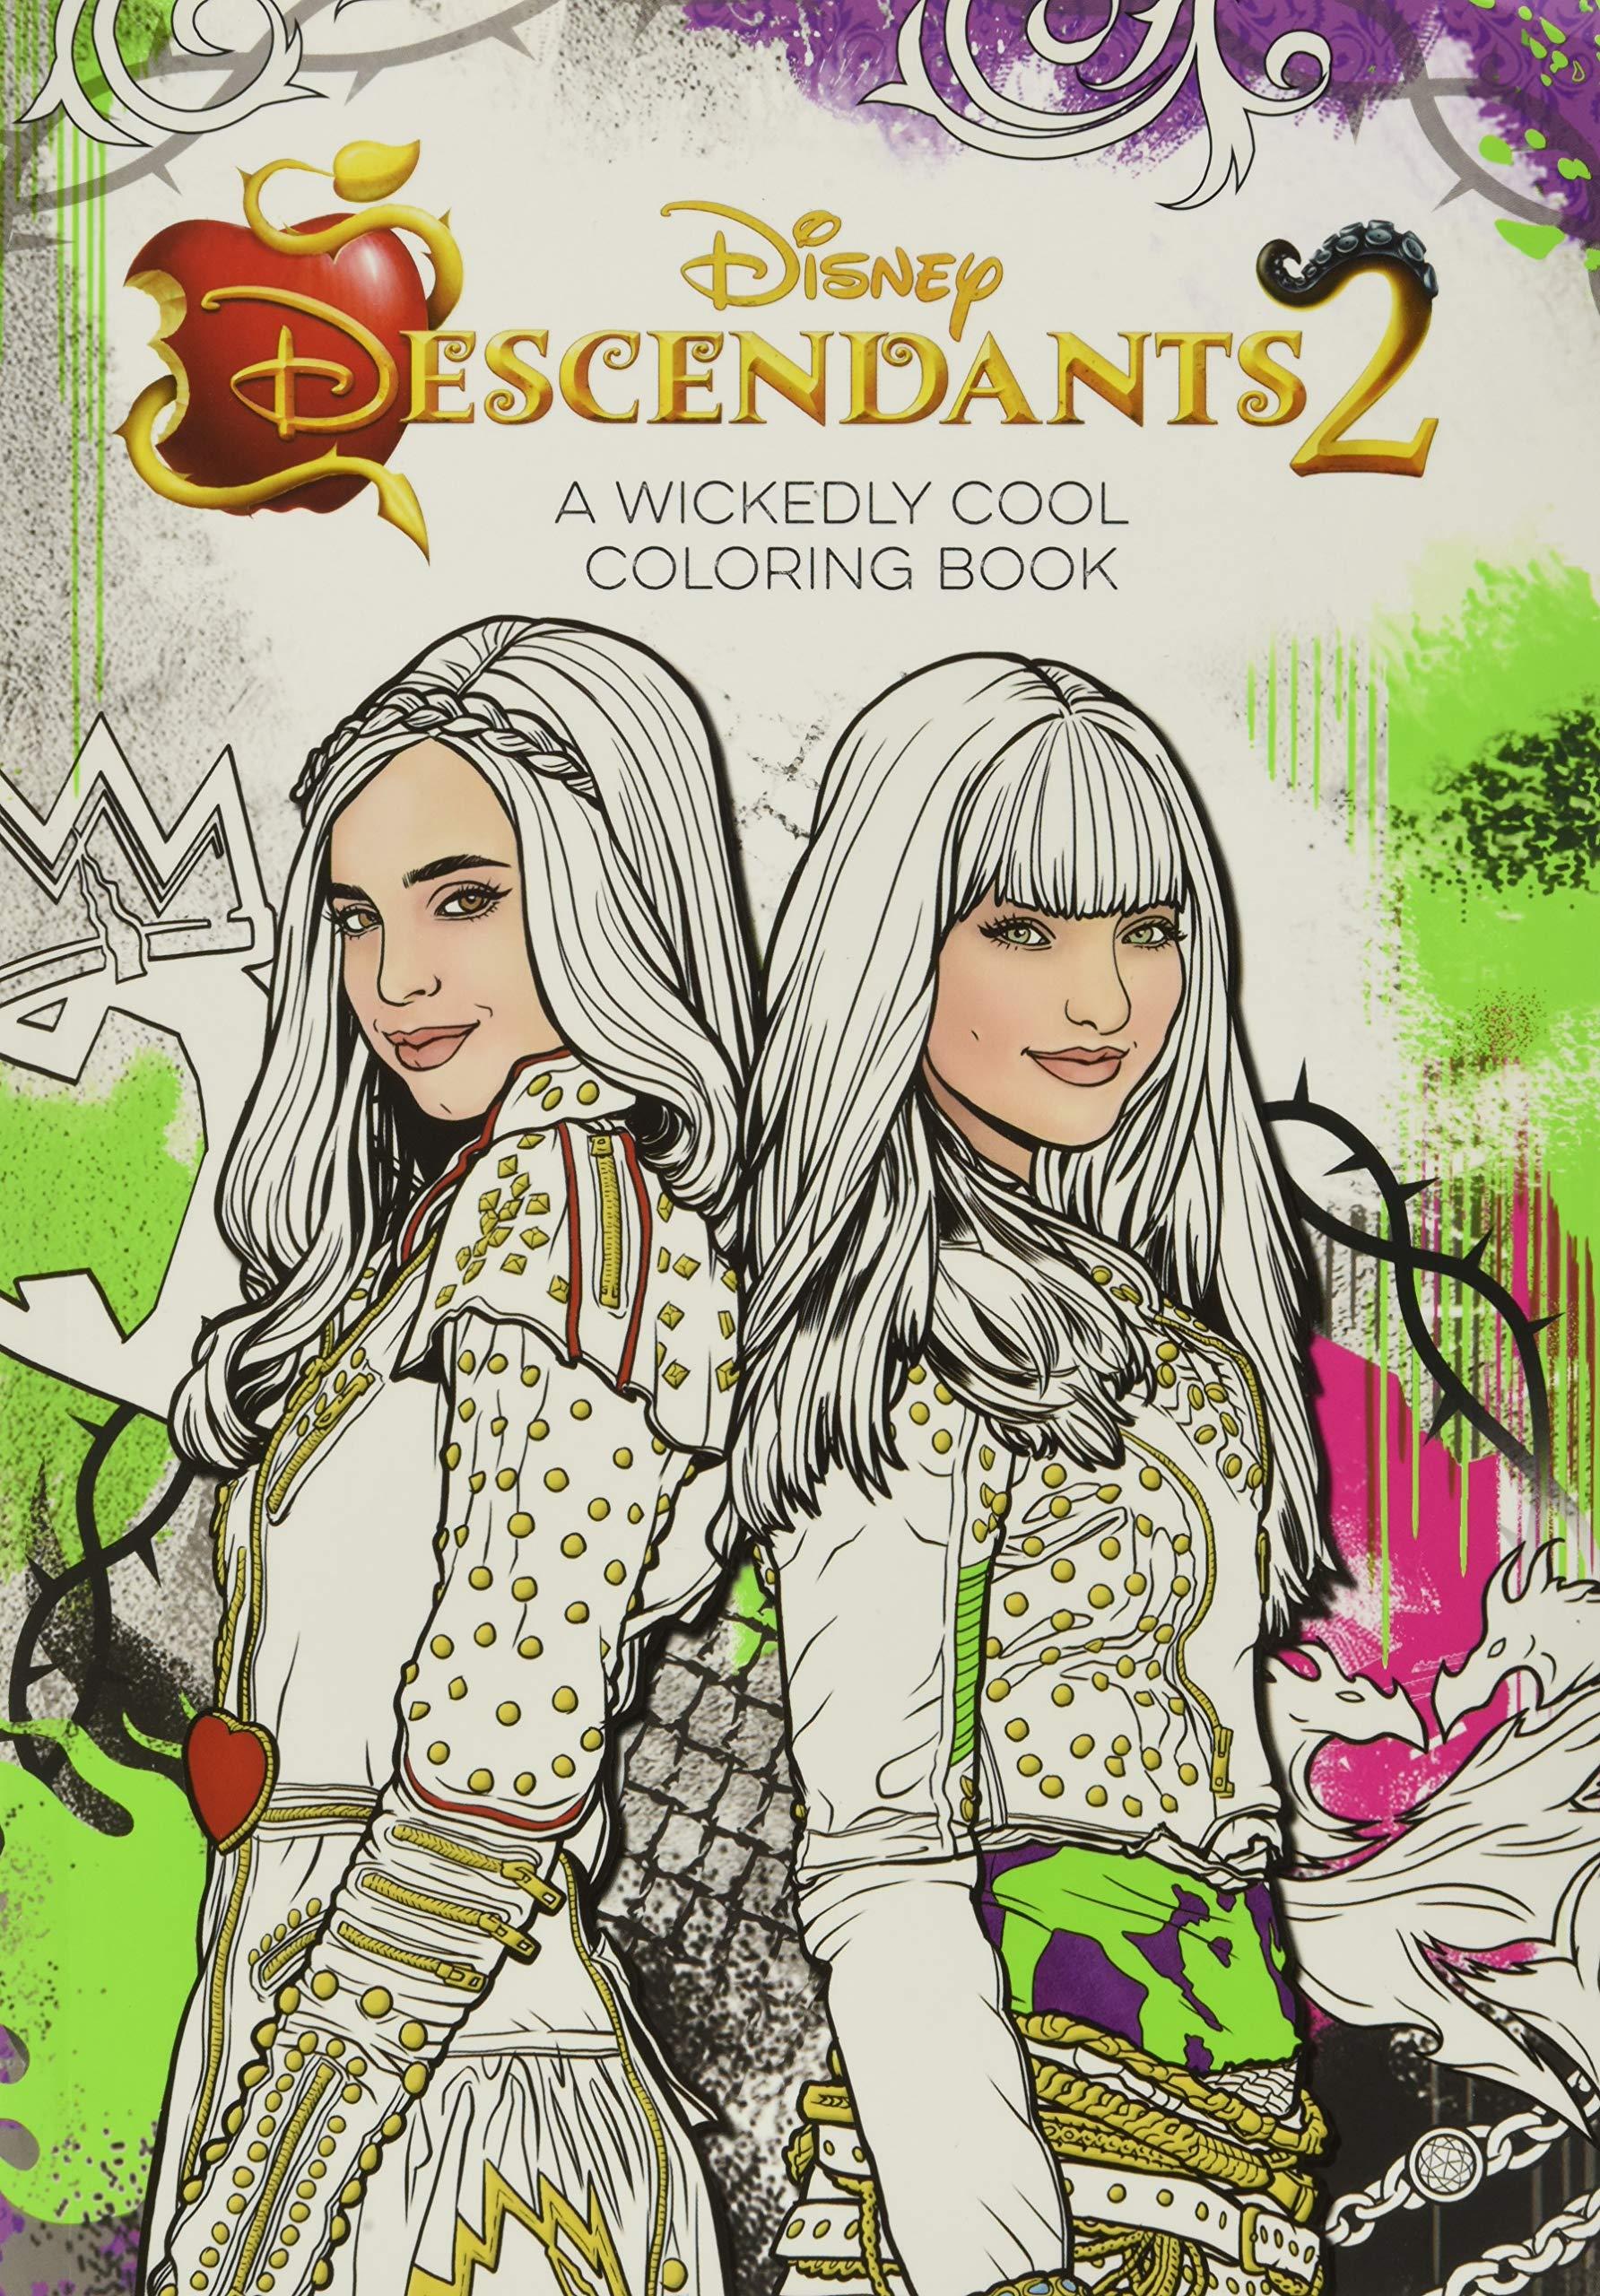 Descendants 2 A Wickedly Cool Coloring Book Art Of Coloring Amazon De Disney Book Group Fremdsprachige Bucher